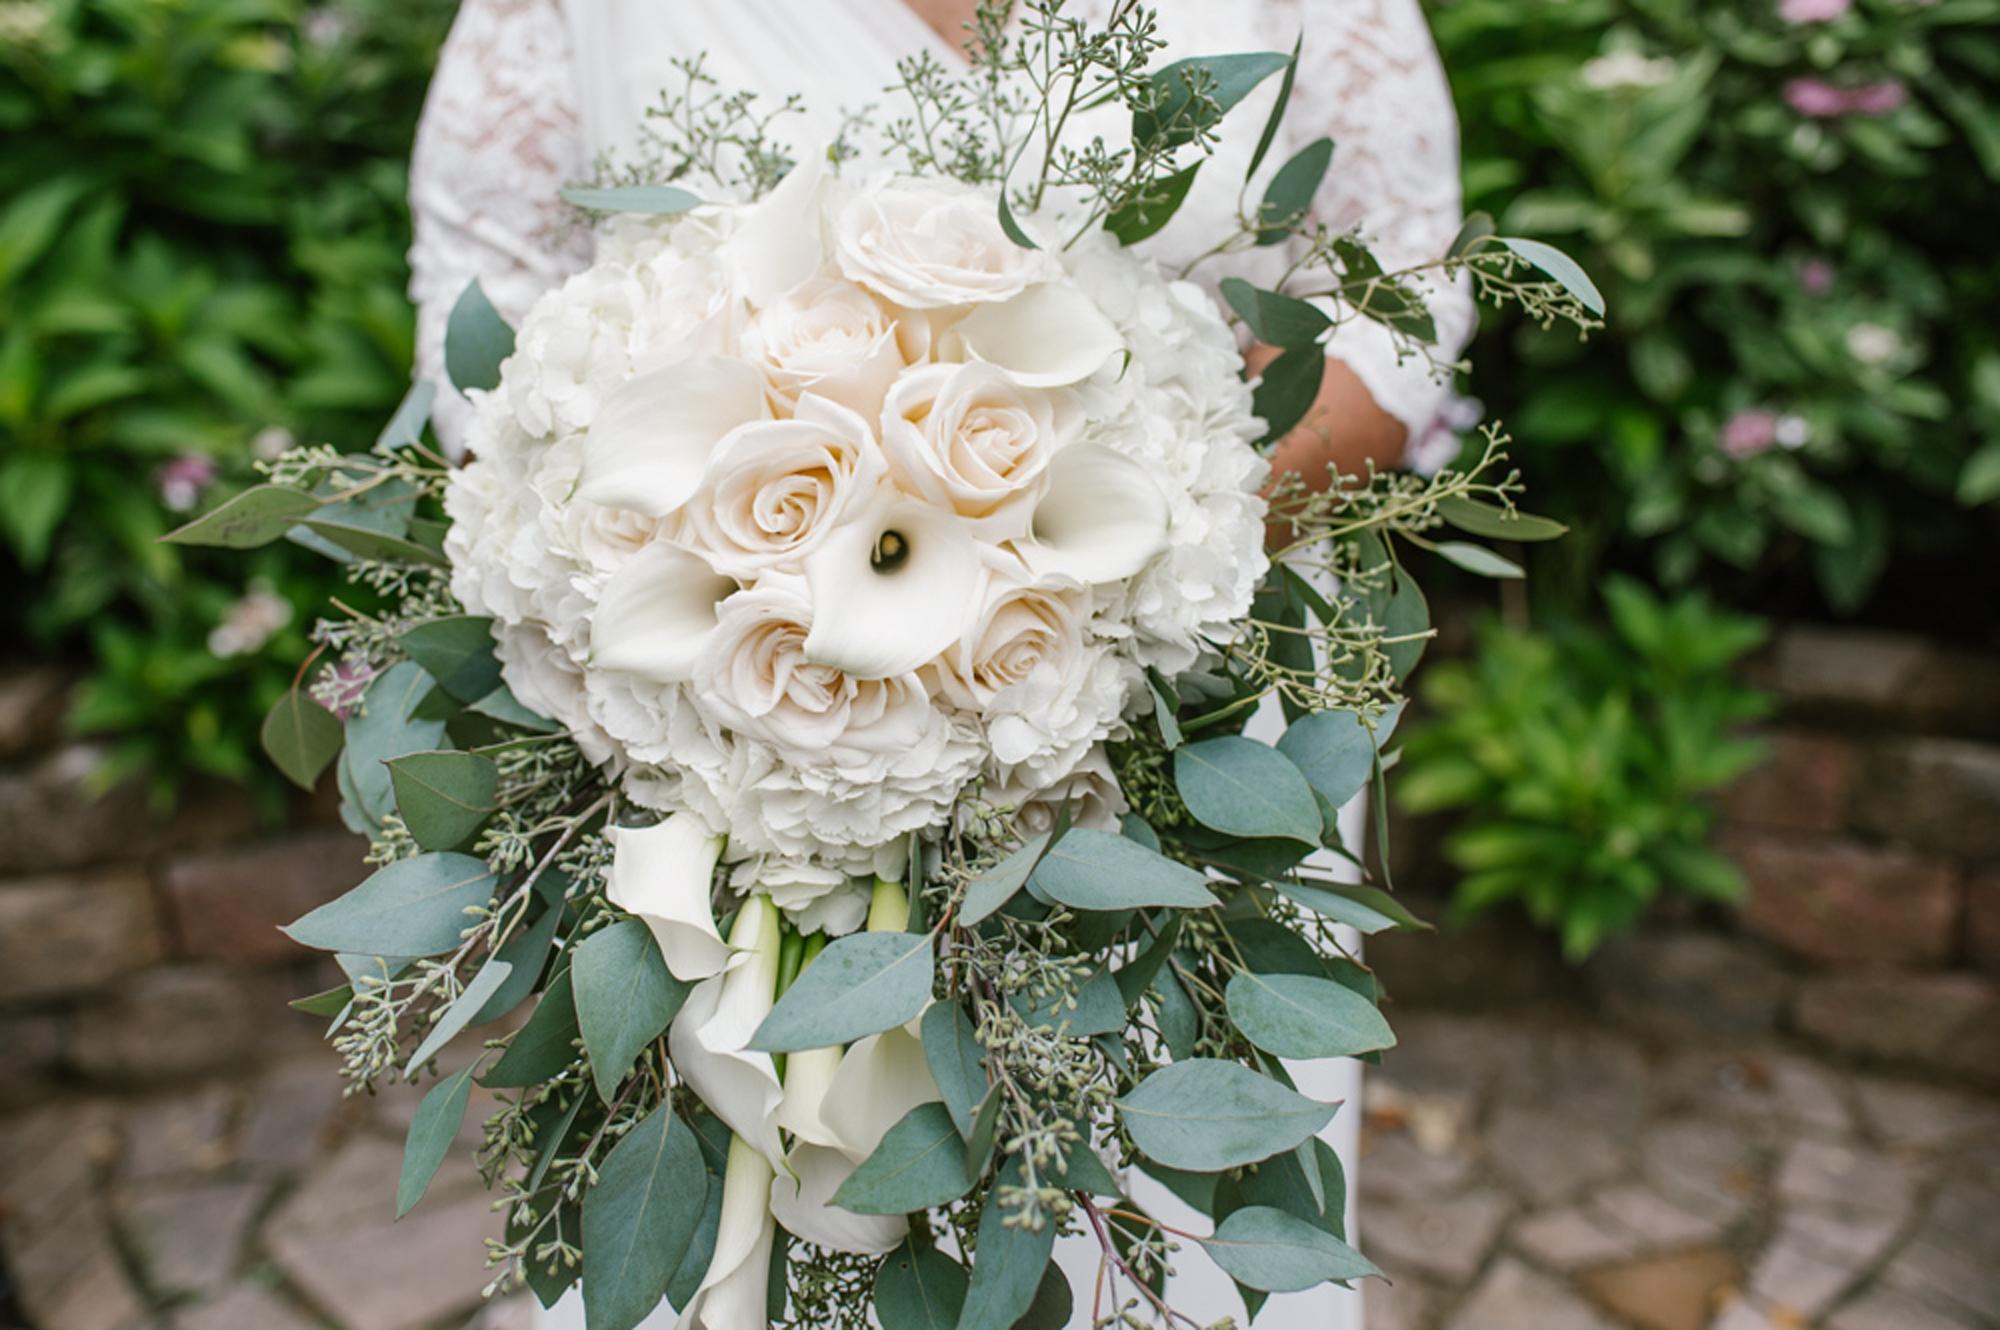 holland-michigan-lgbtq-wedding-midtown-center-wedding-photographer-sydney-marie-63.jpg